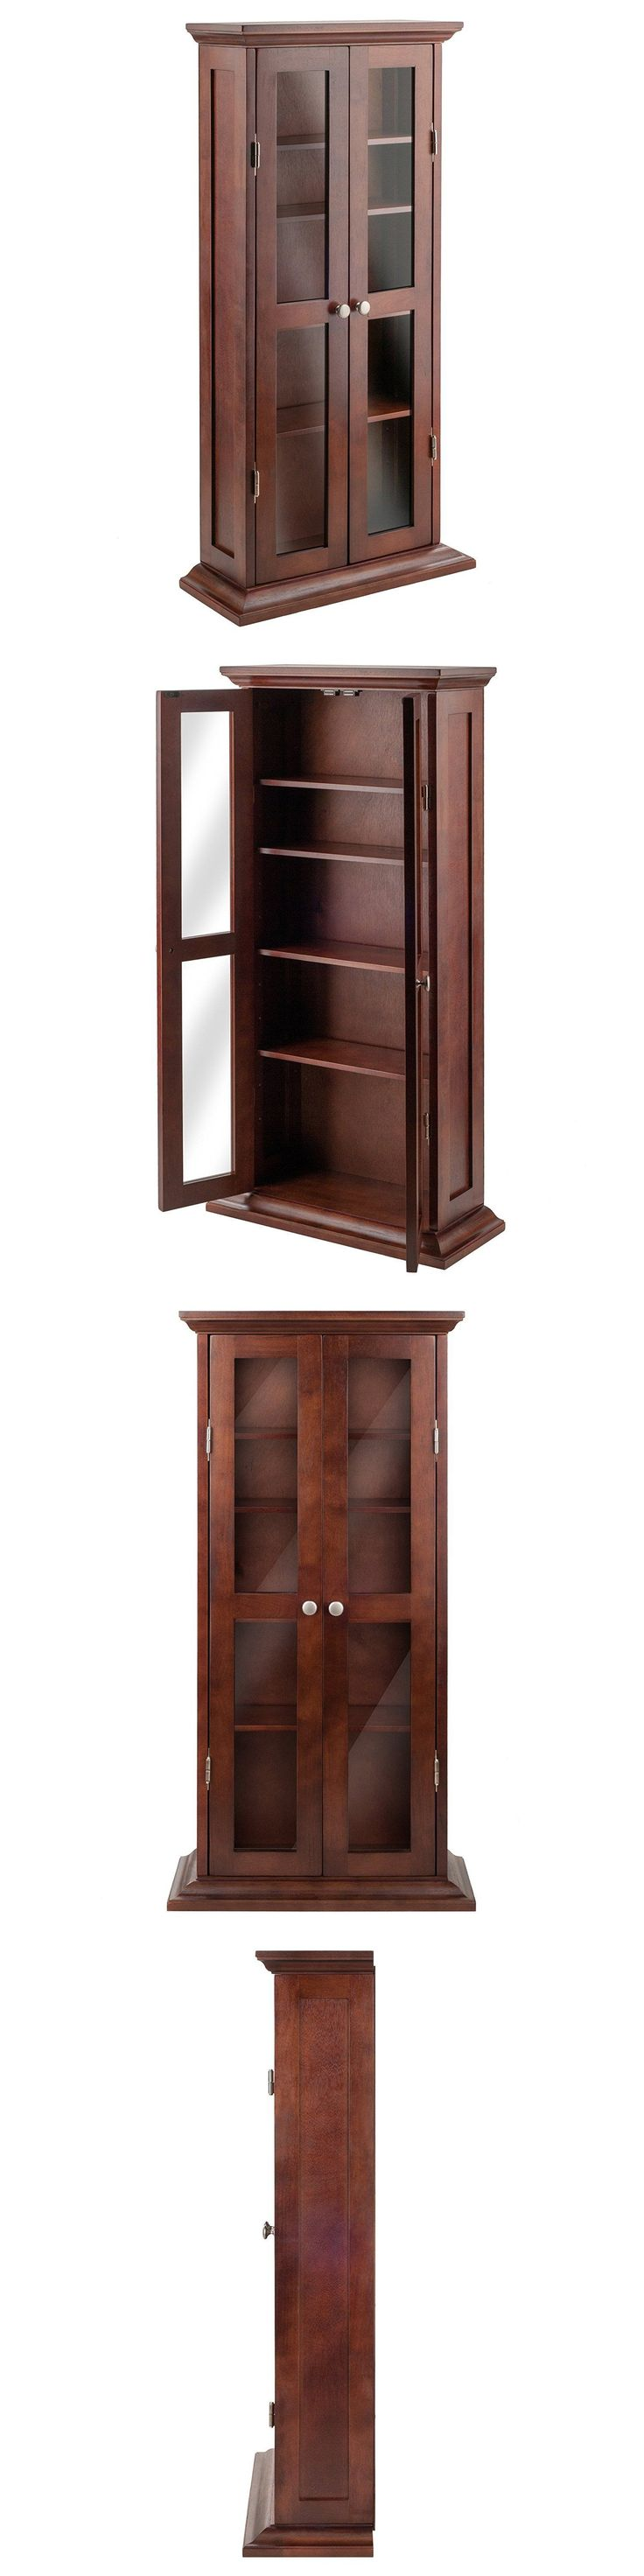 CD And Video Racks 22653: Dvd Storage Cabinet Glass Doors Rack Cd Bookshelf  Organizer Antique